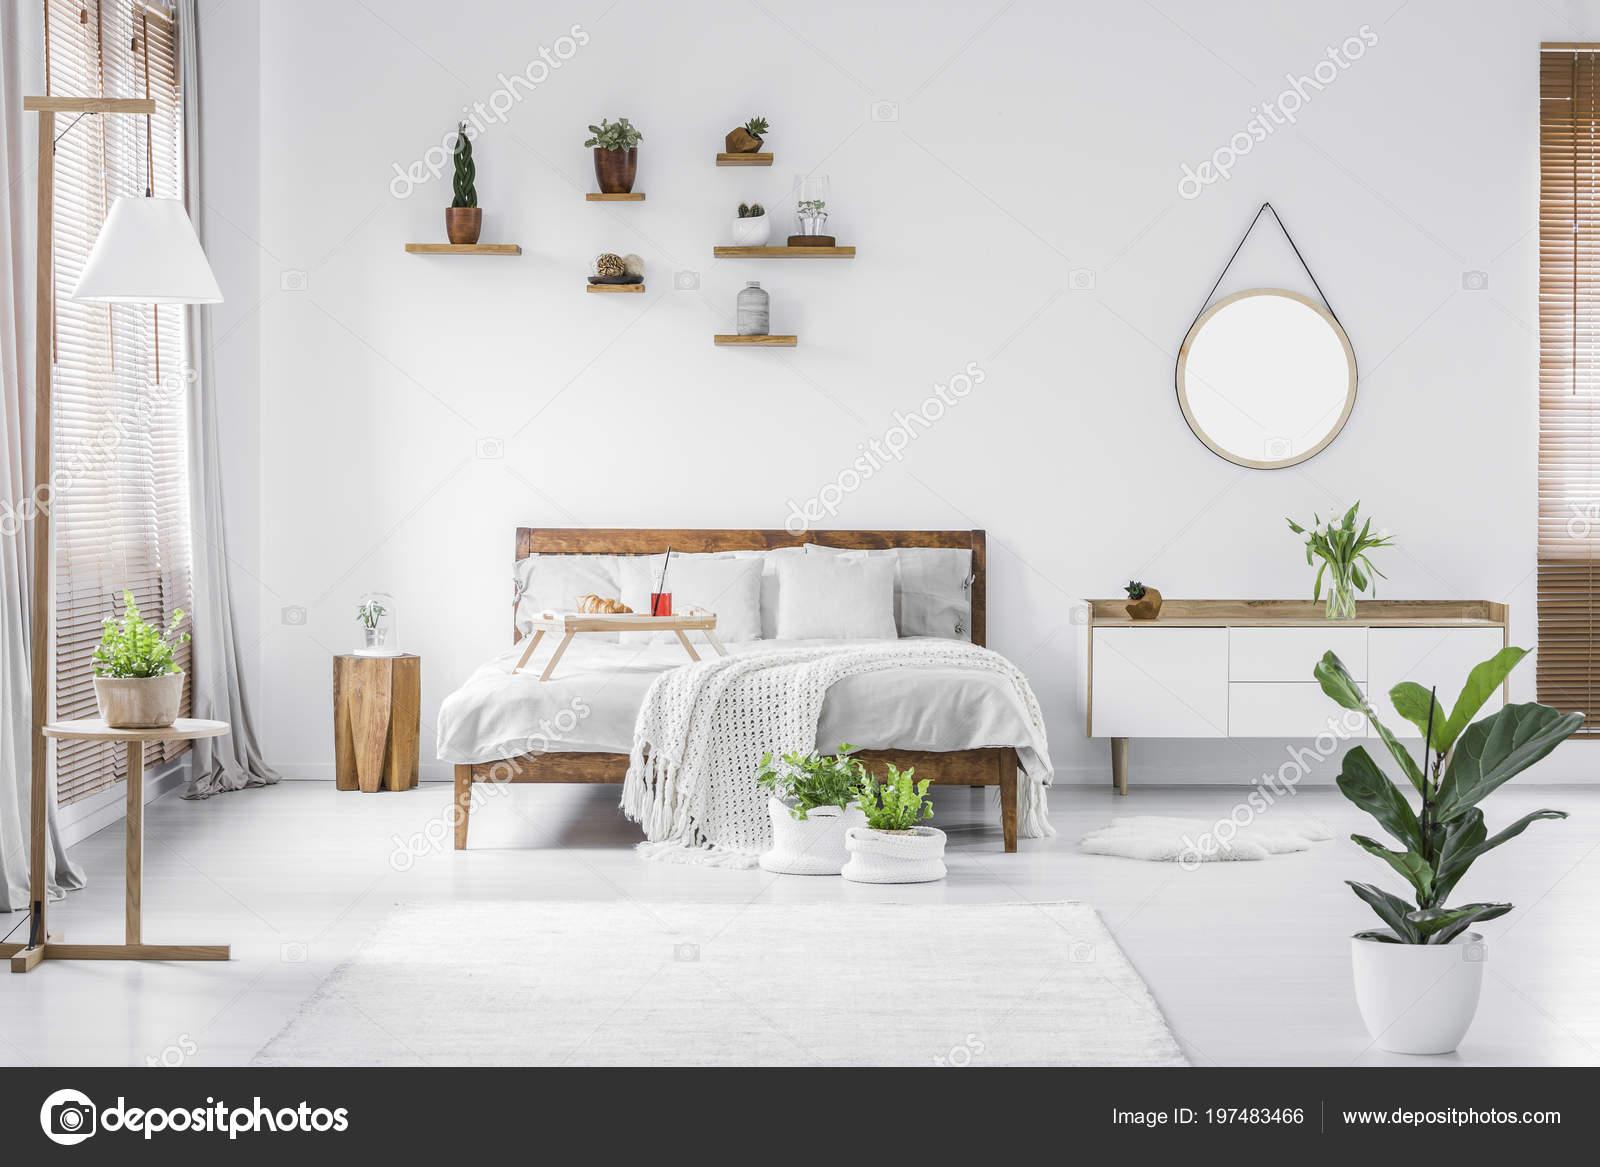 Moderne Witte Slaapkamer : Ochtend een lichte zonnige moderne witte slaapkamer interieur met